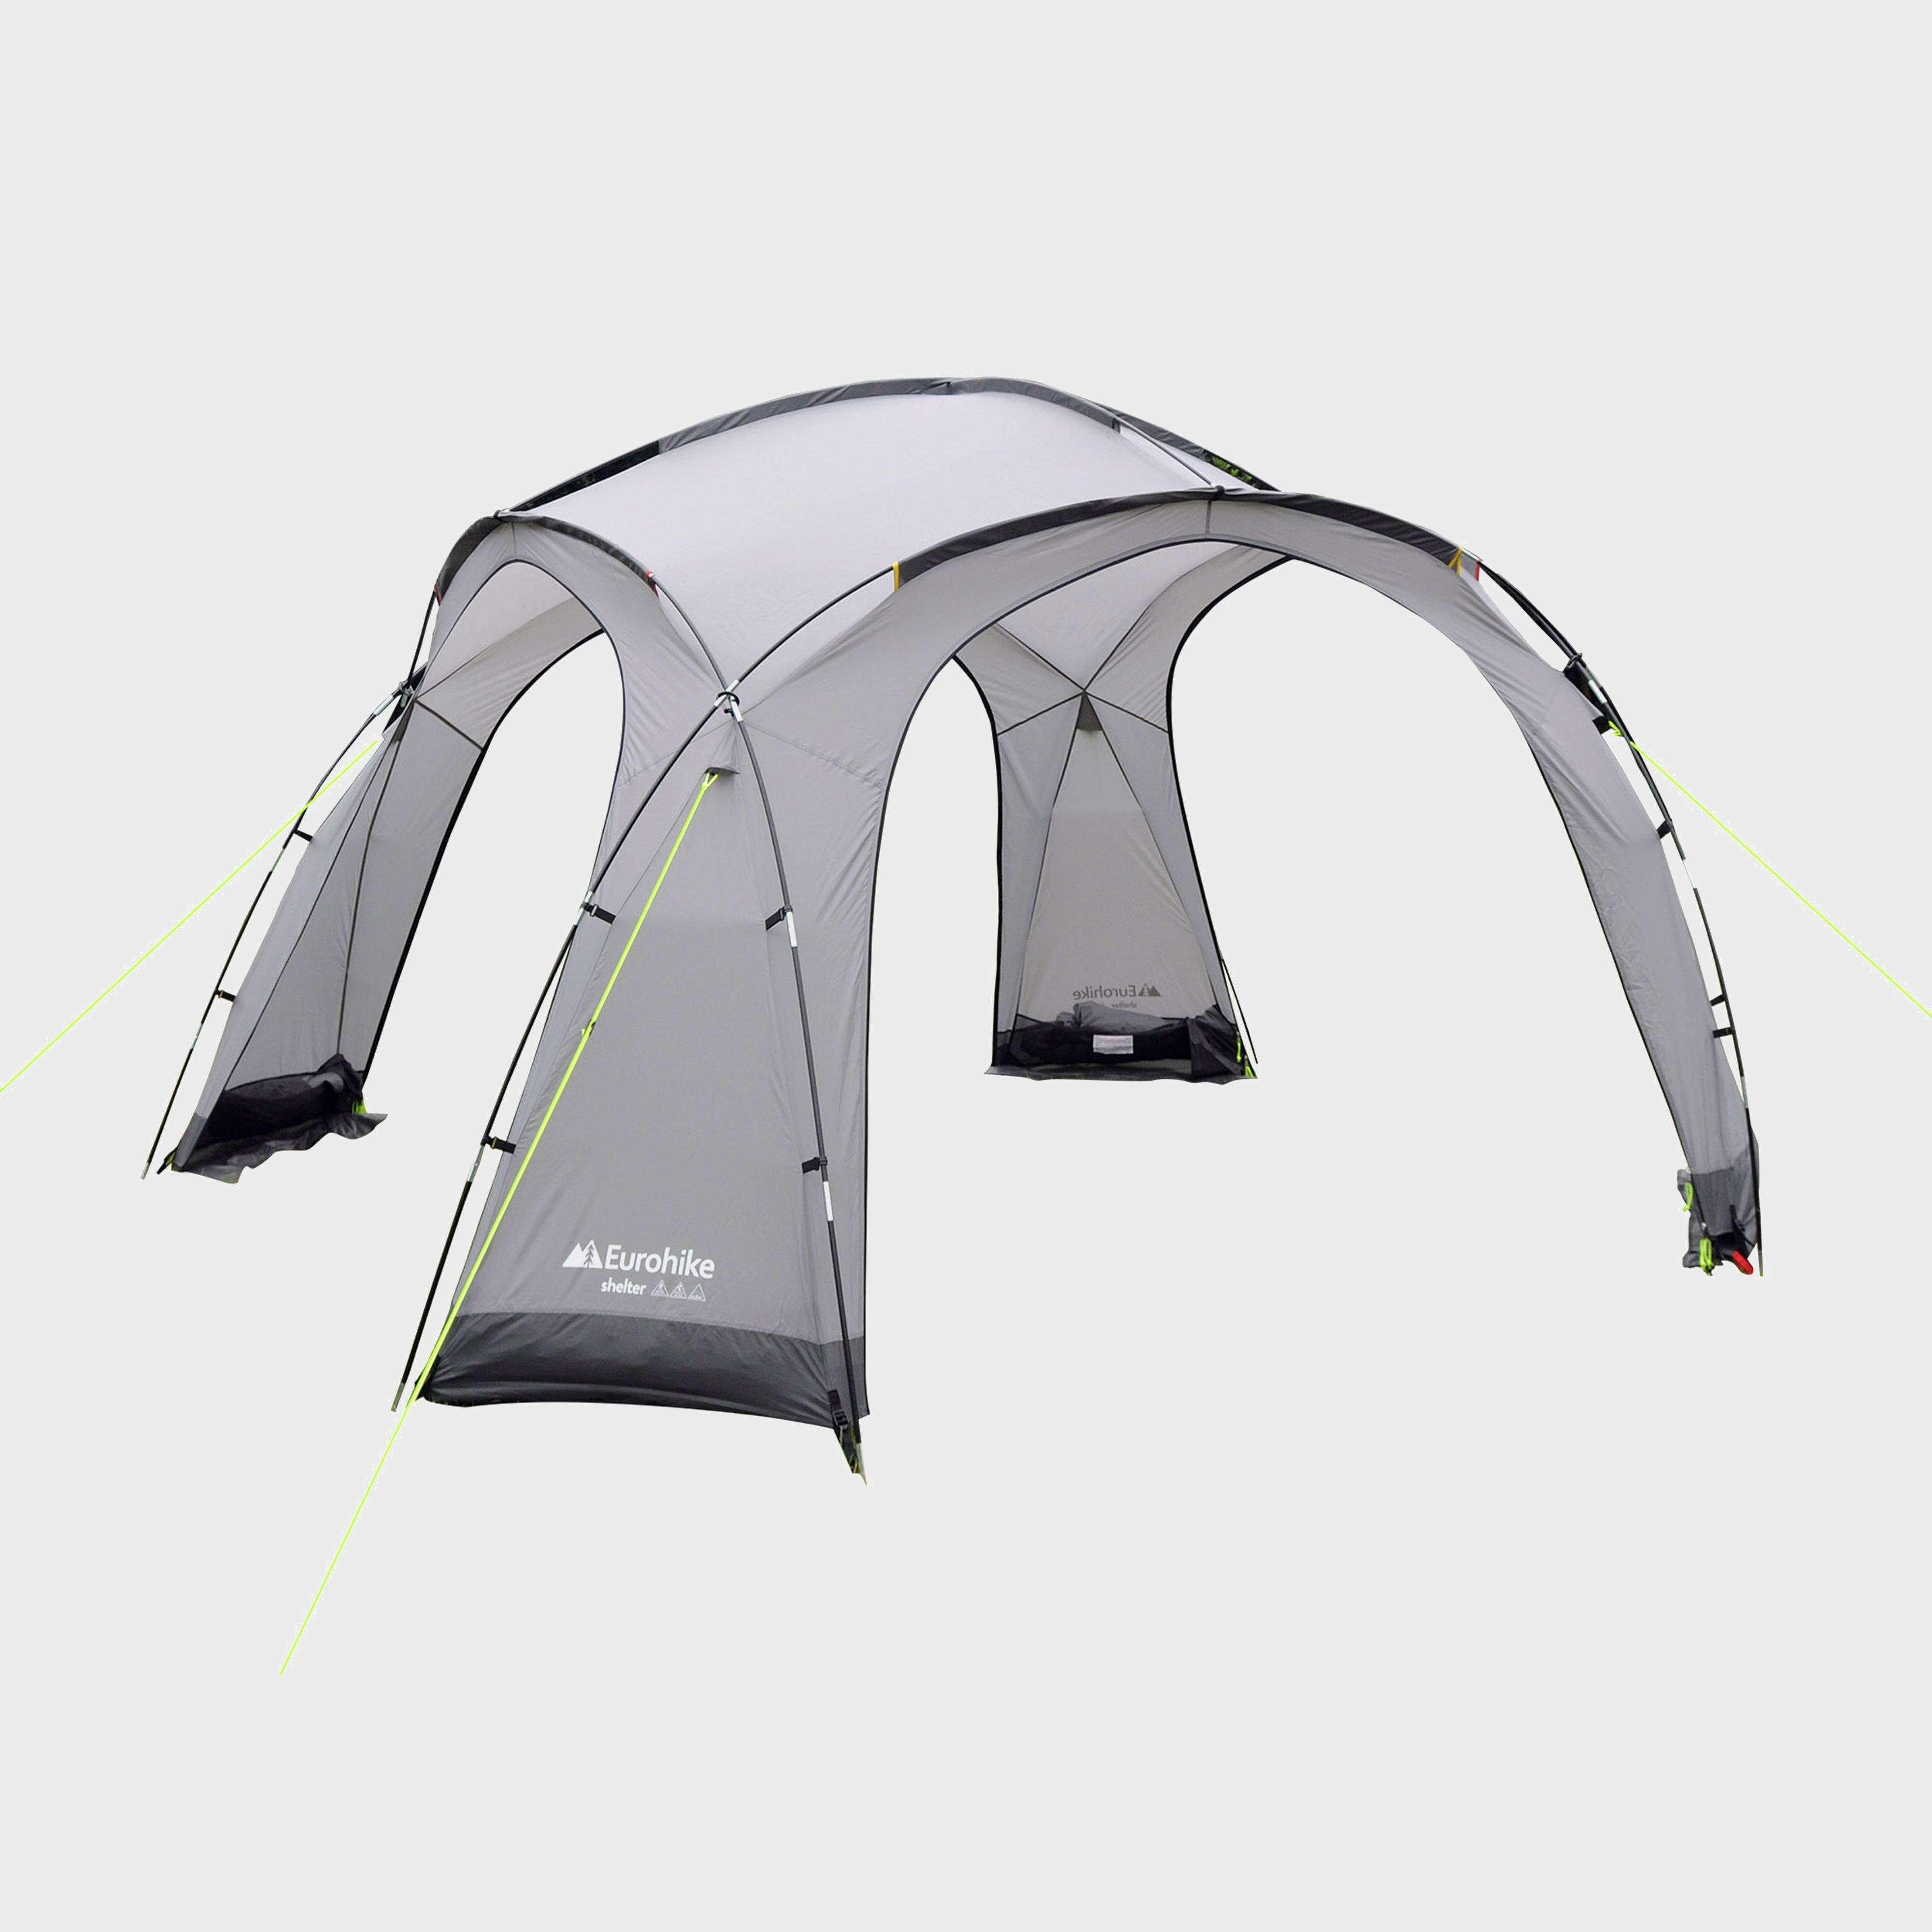 EUROHIKE Dome Shelter 12x12